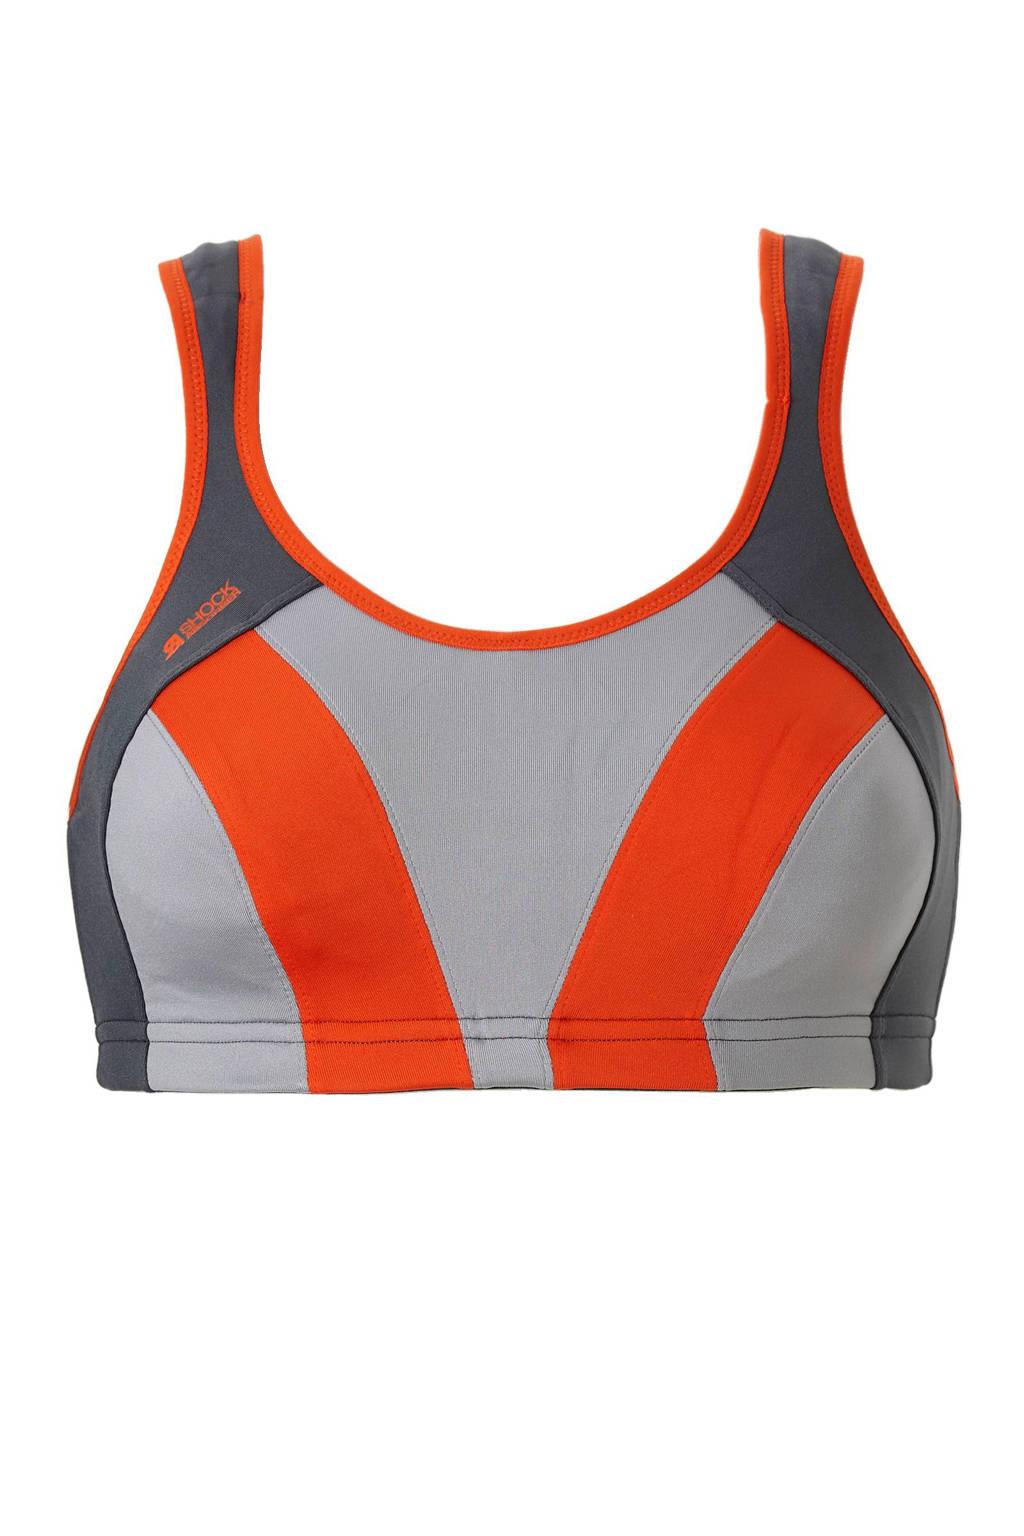 Shock Absorber sportbh Active Multi Sport Support grijs/oranje, Grijs/oranje